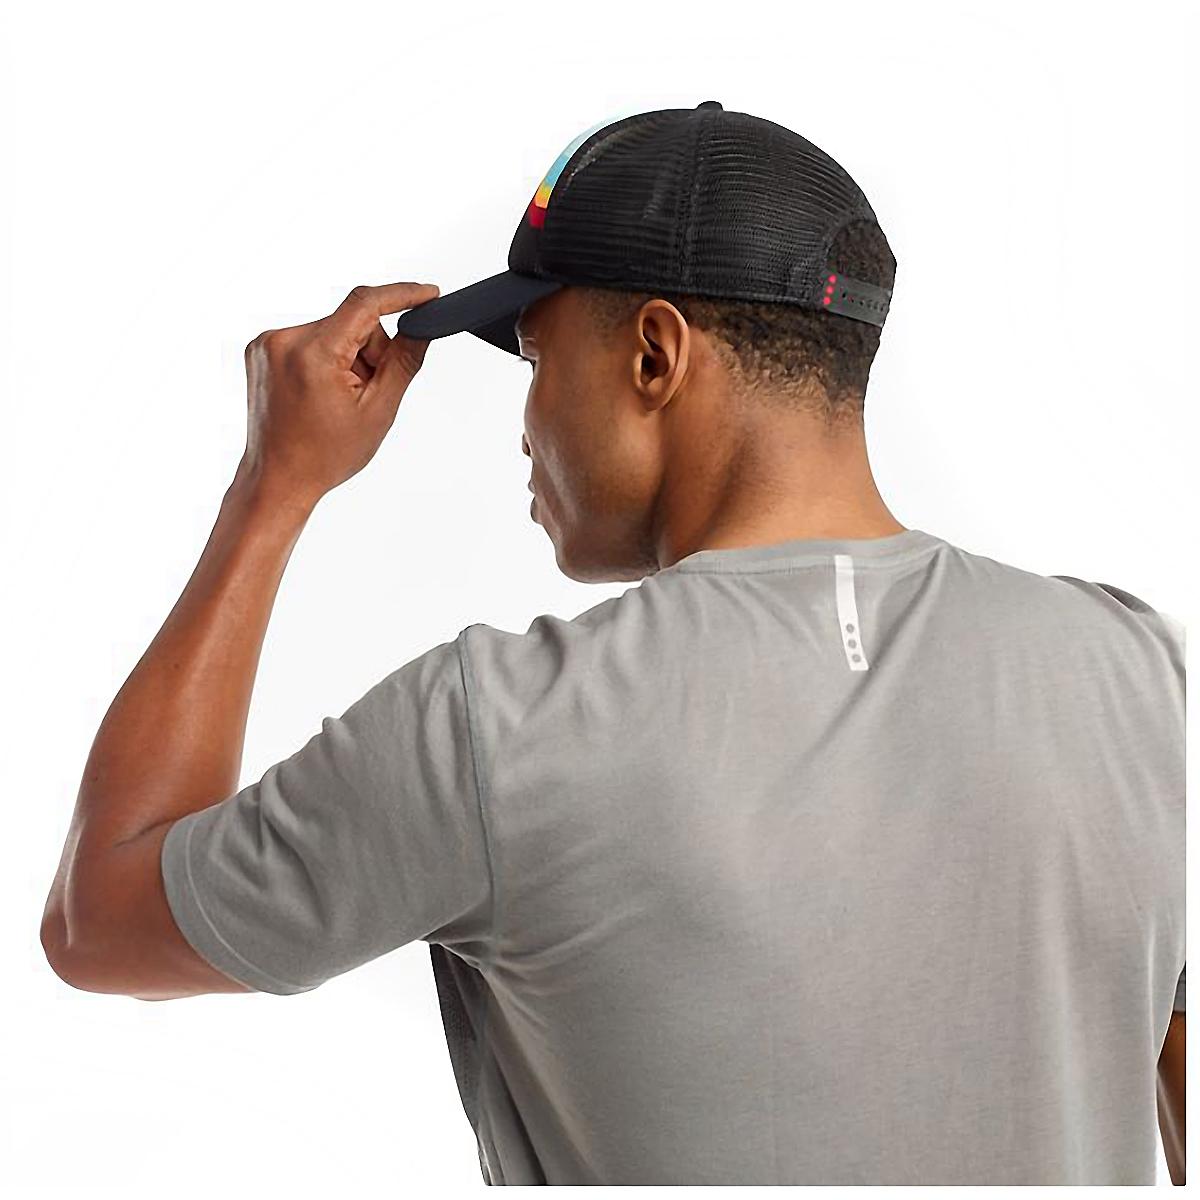 Saucony Foam Trucker Hat - Color: Black, Black, large, image 4